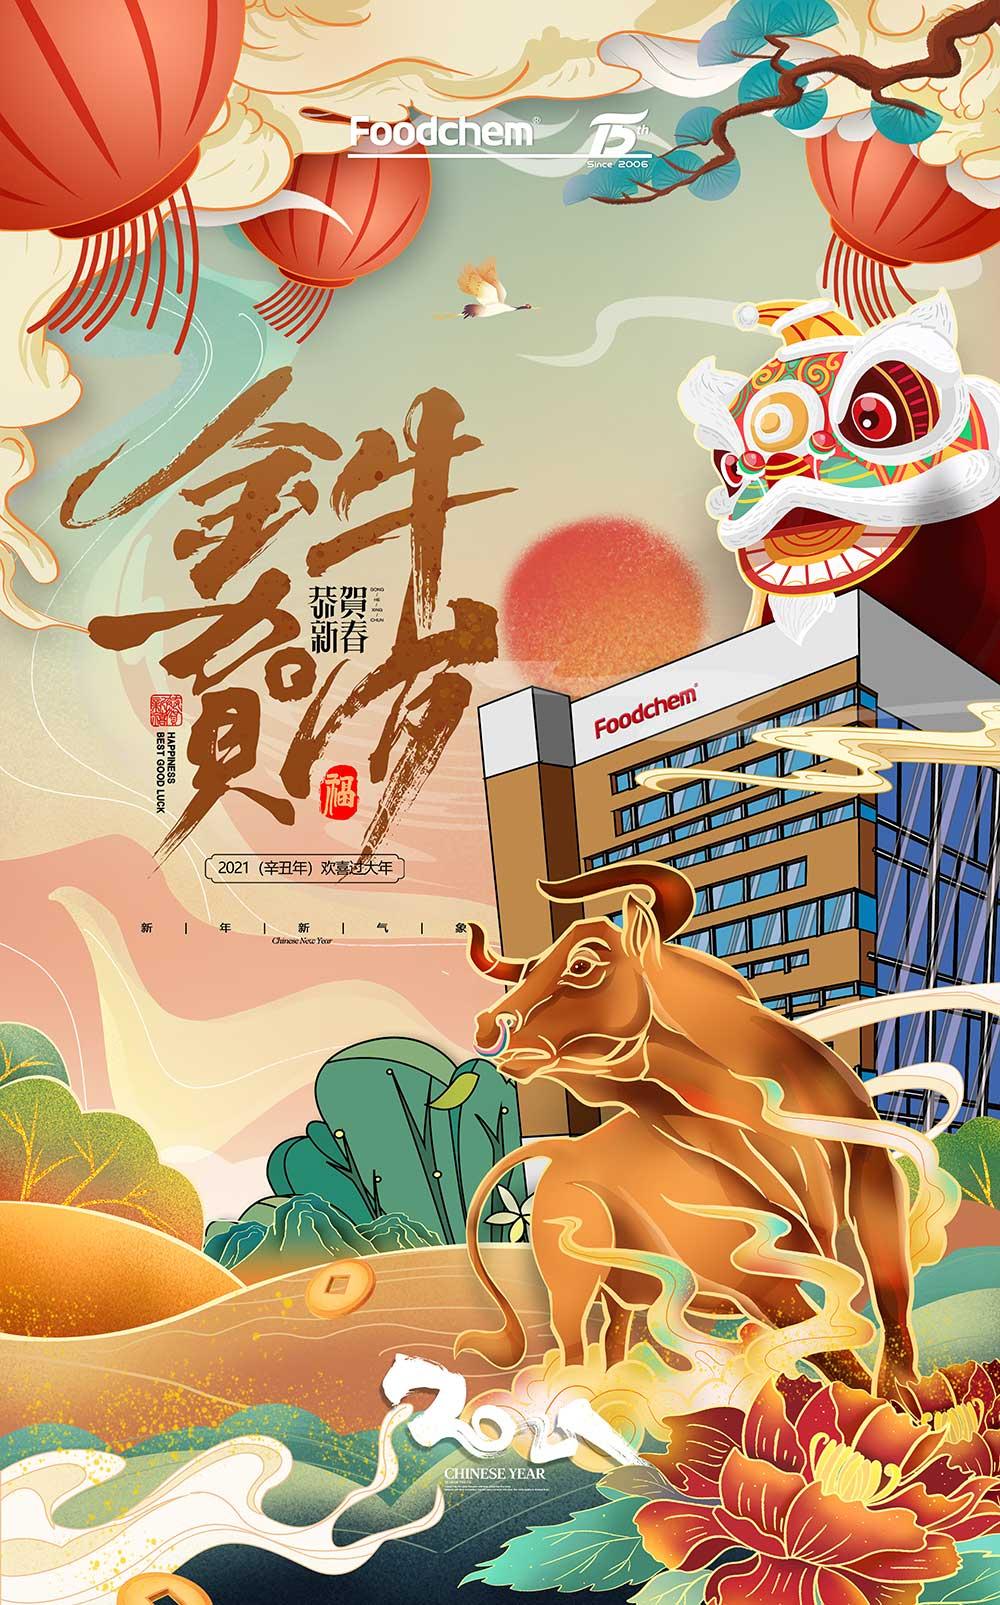 Happy Chinese New Year -Foodchem®